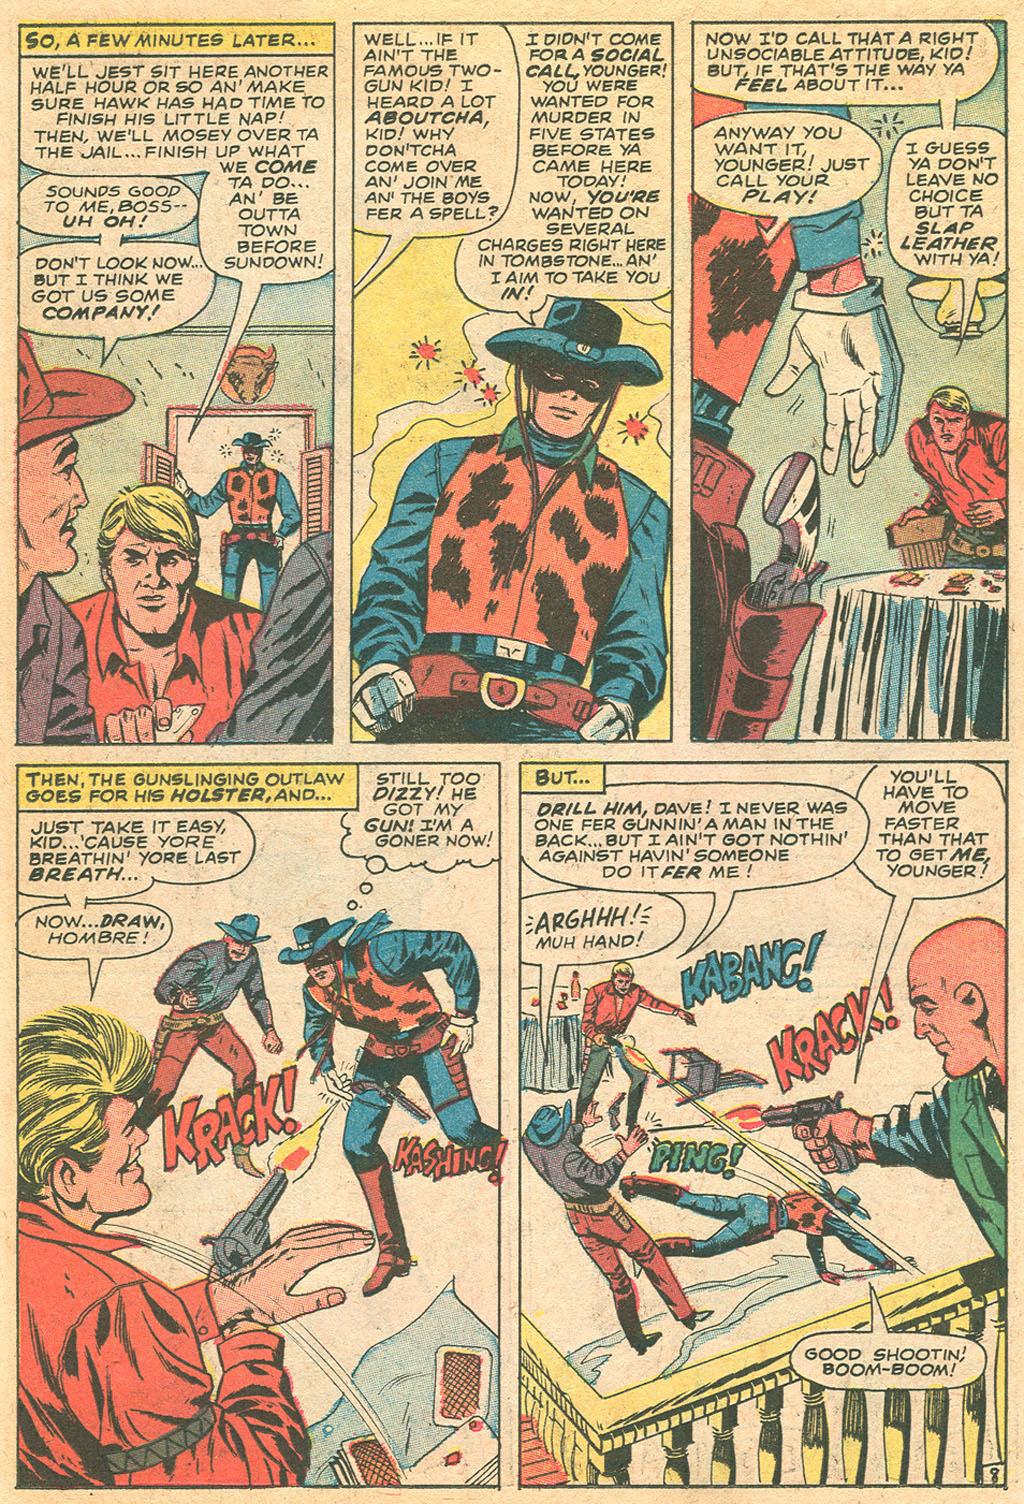 Read online Two-Gun Kid comic -  Issue #86 - 11